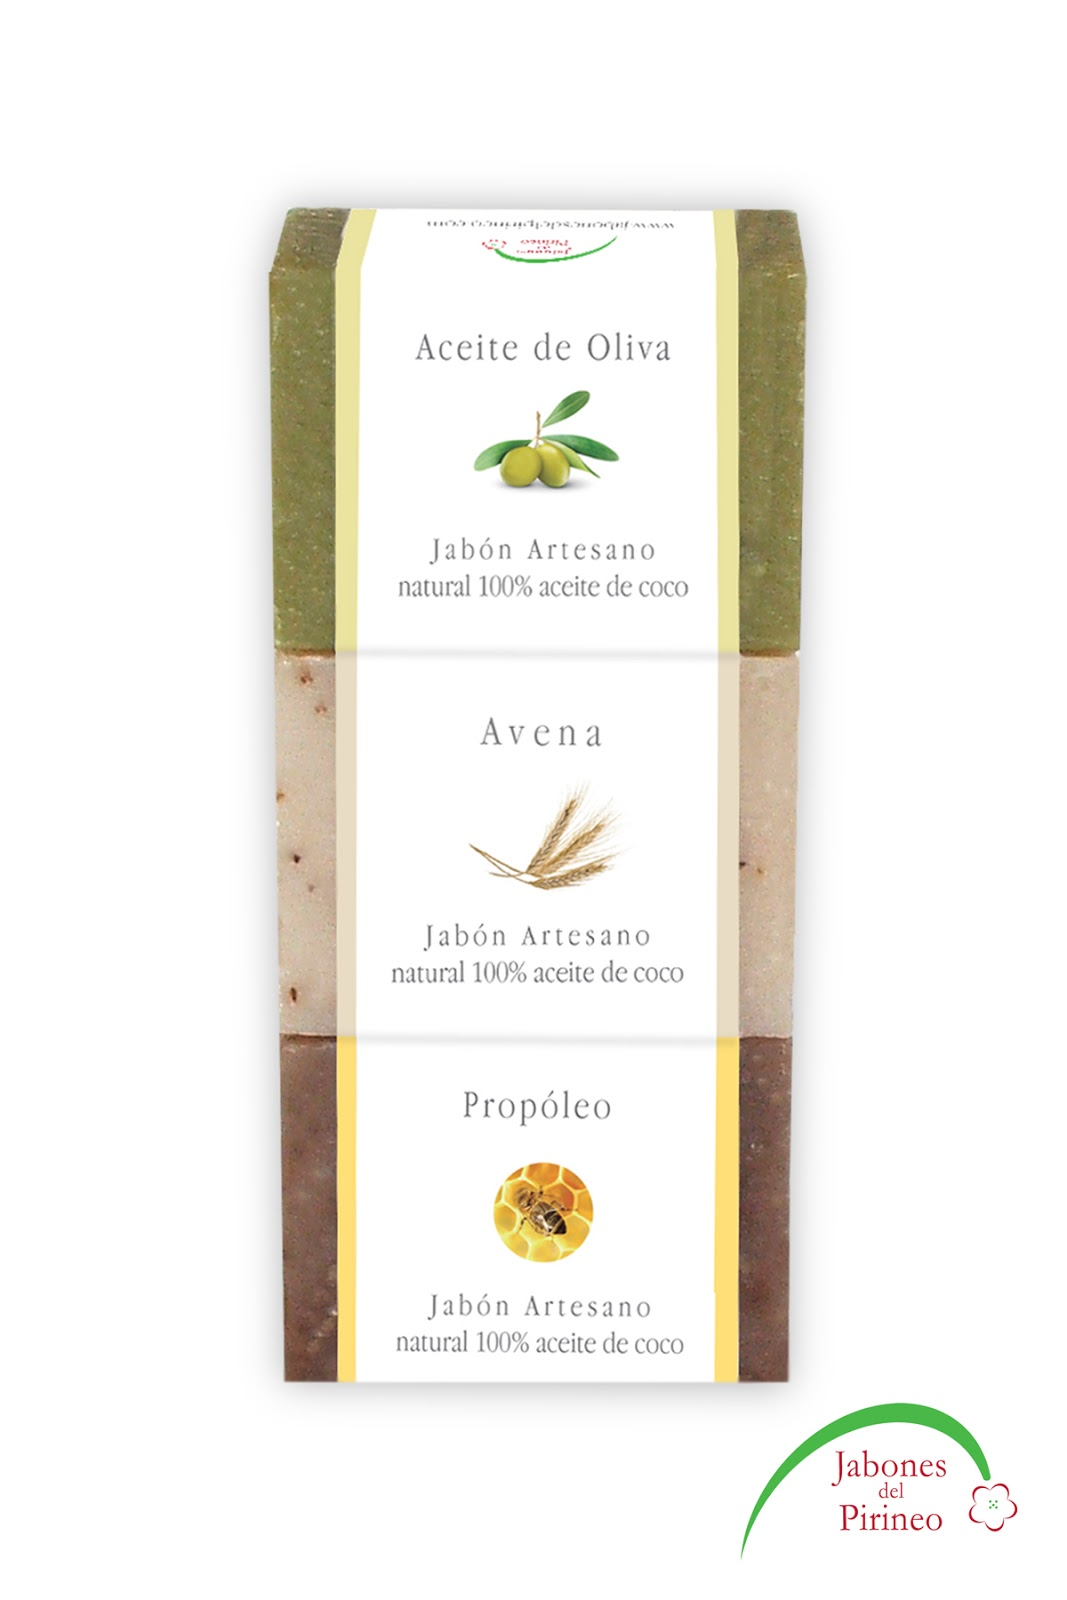 Jabones Naturales Aceite Oliva Avena Propóleo